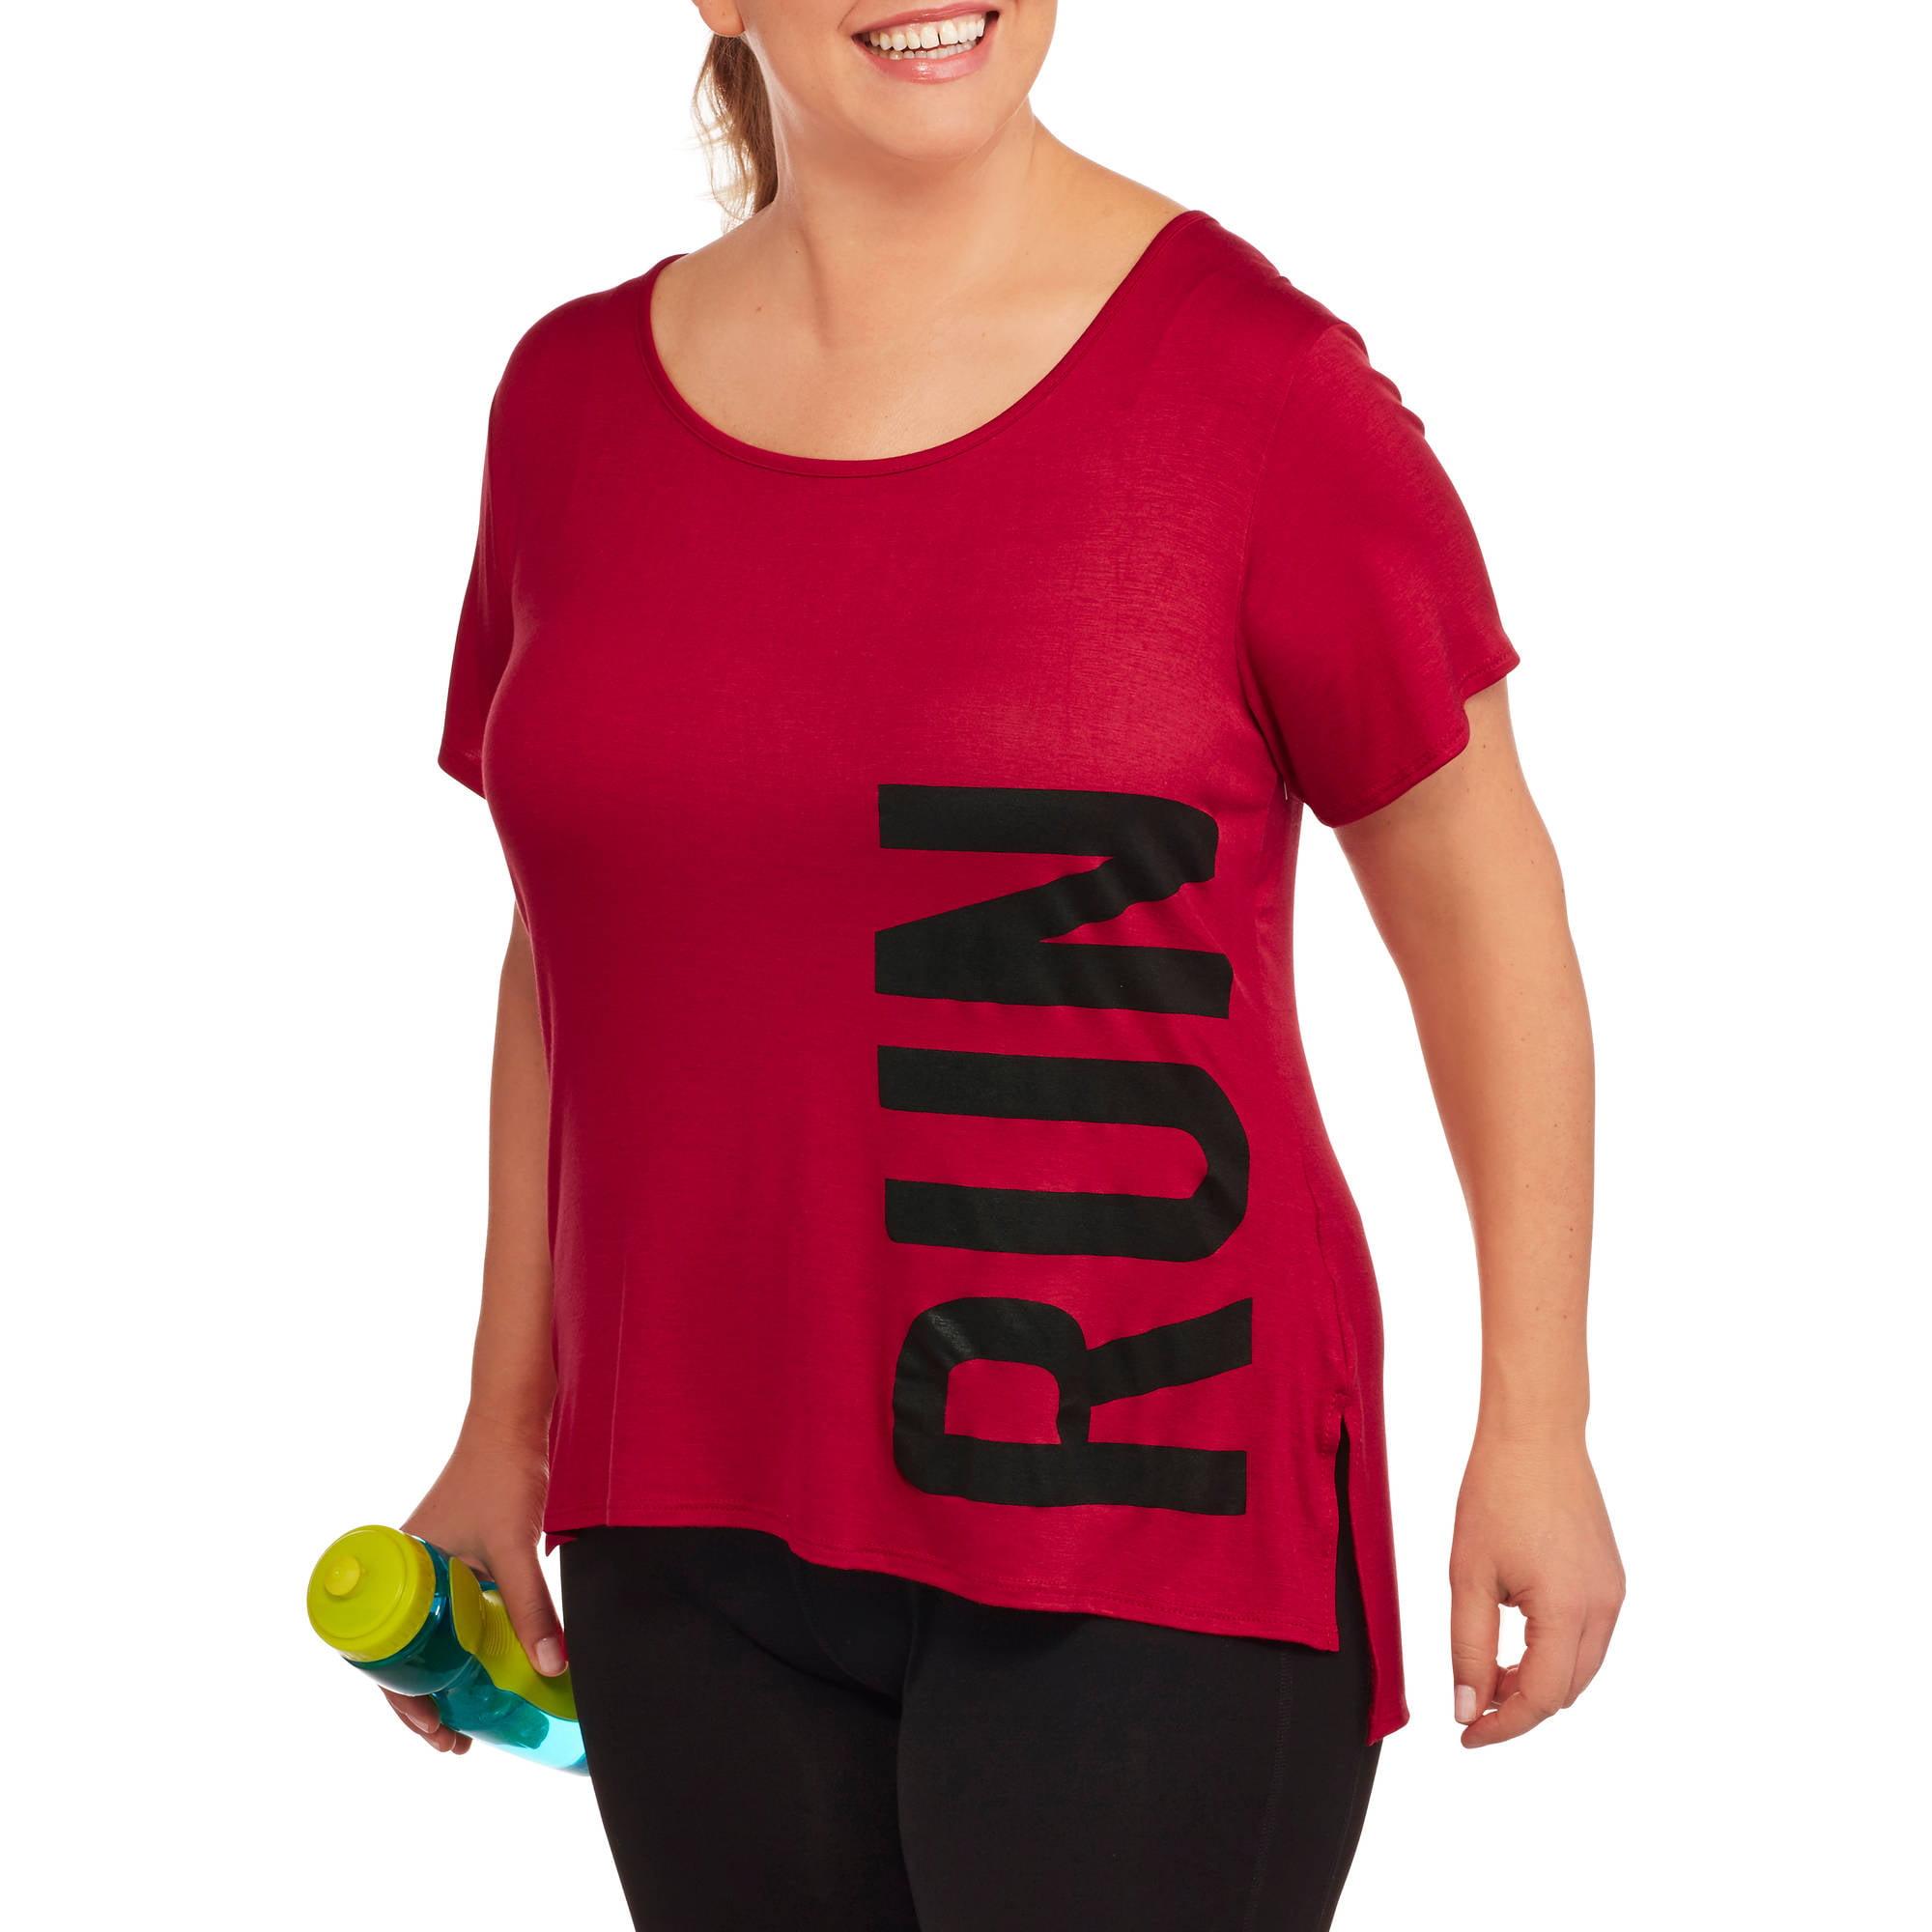 Fitspiration Women's Plus 'Run' Crew Neck Active Graphic T-Shirt